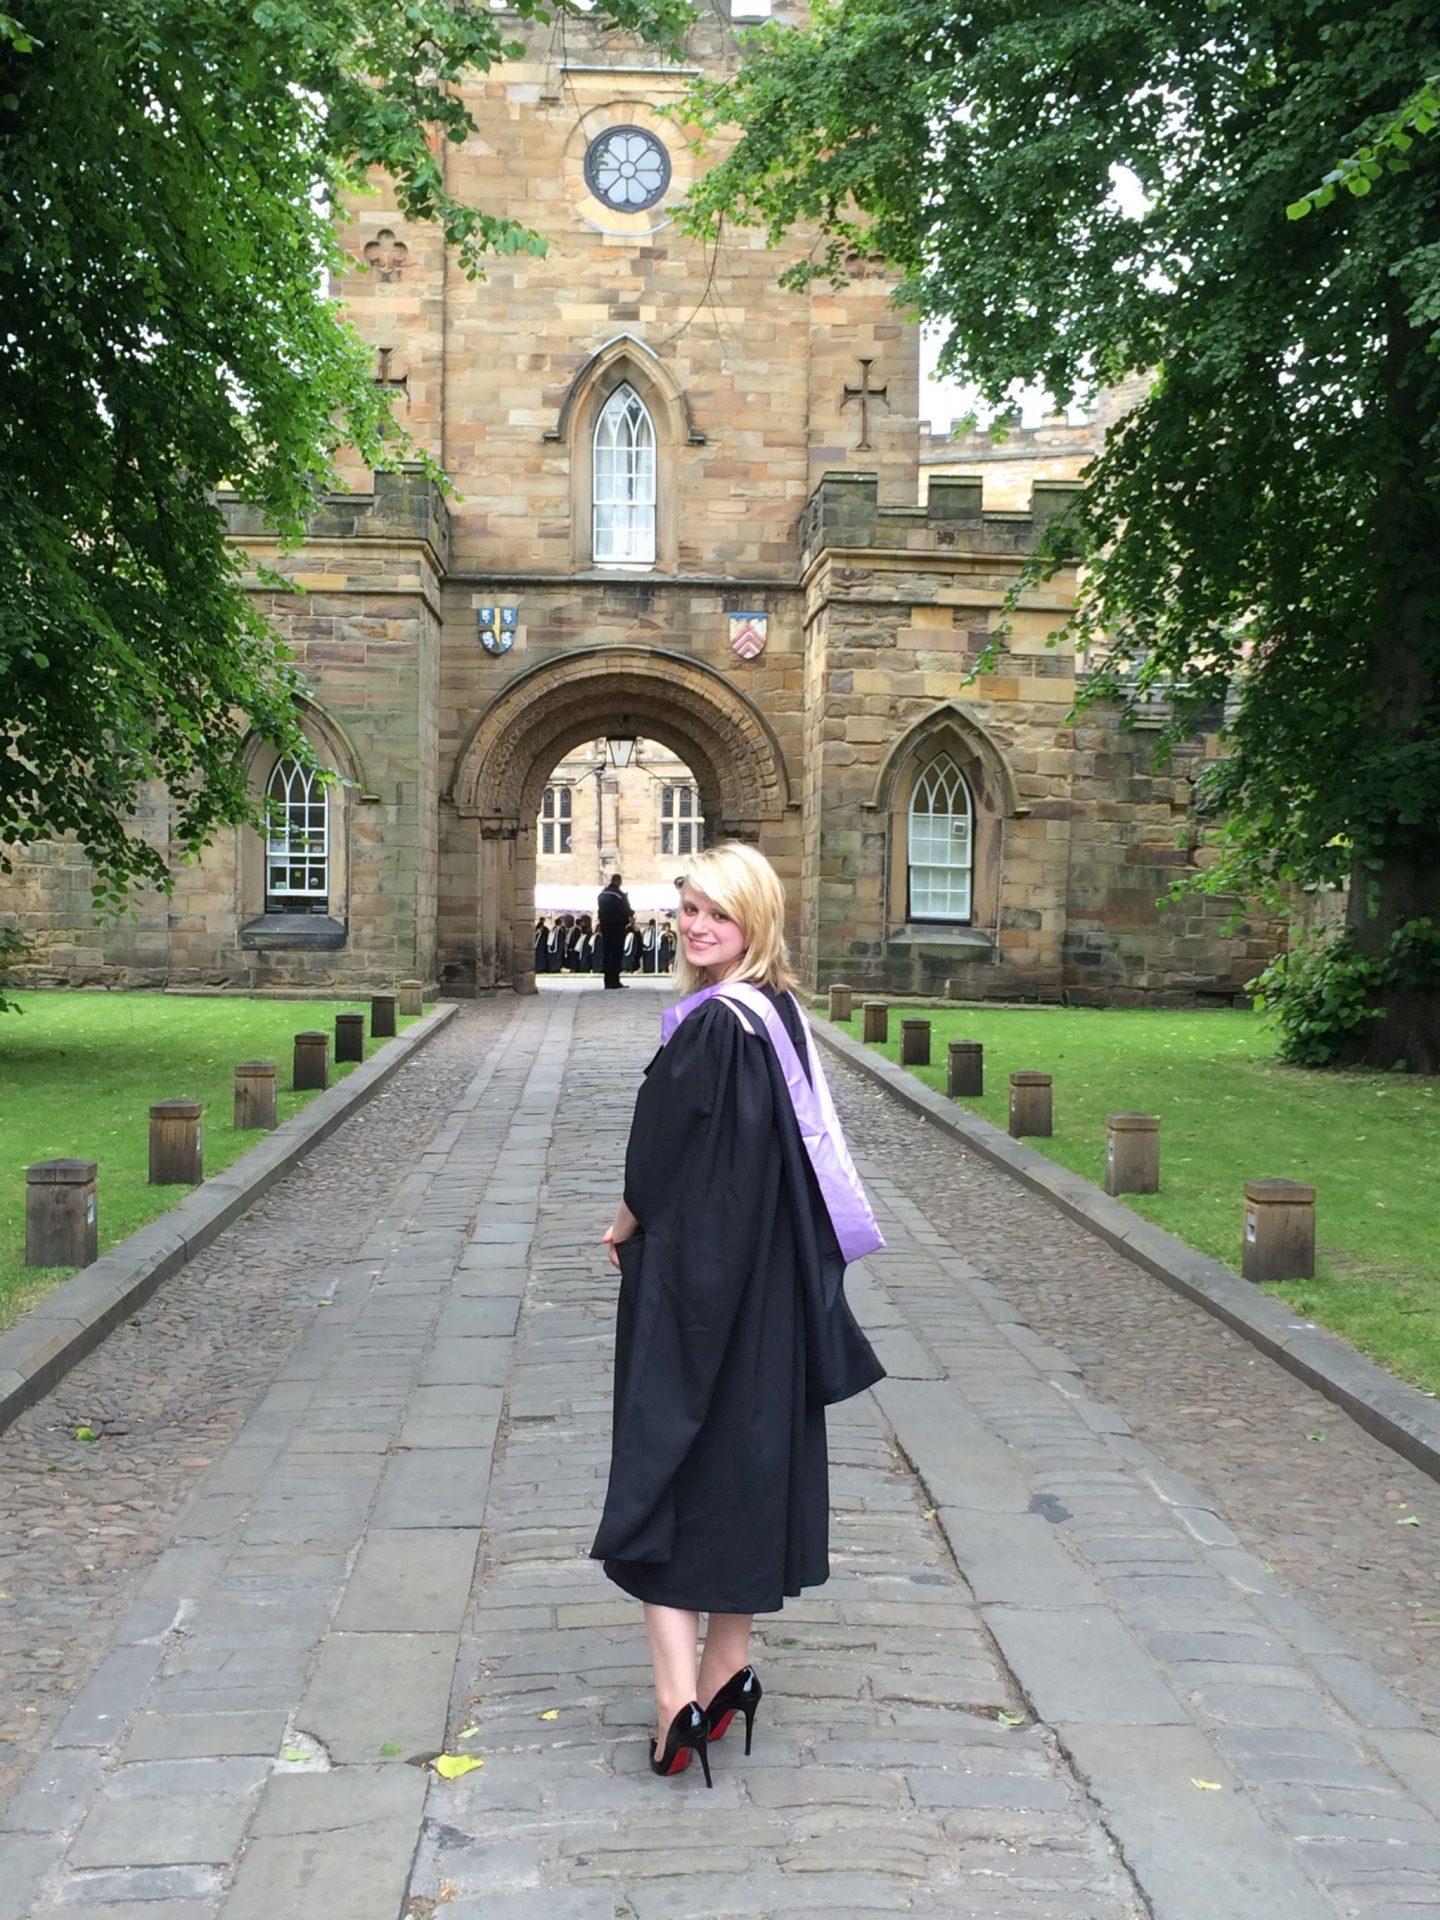 Graduating from Durham University